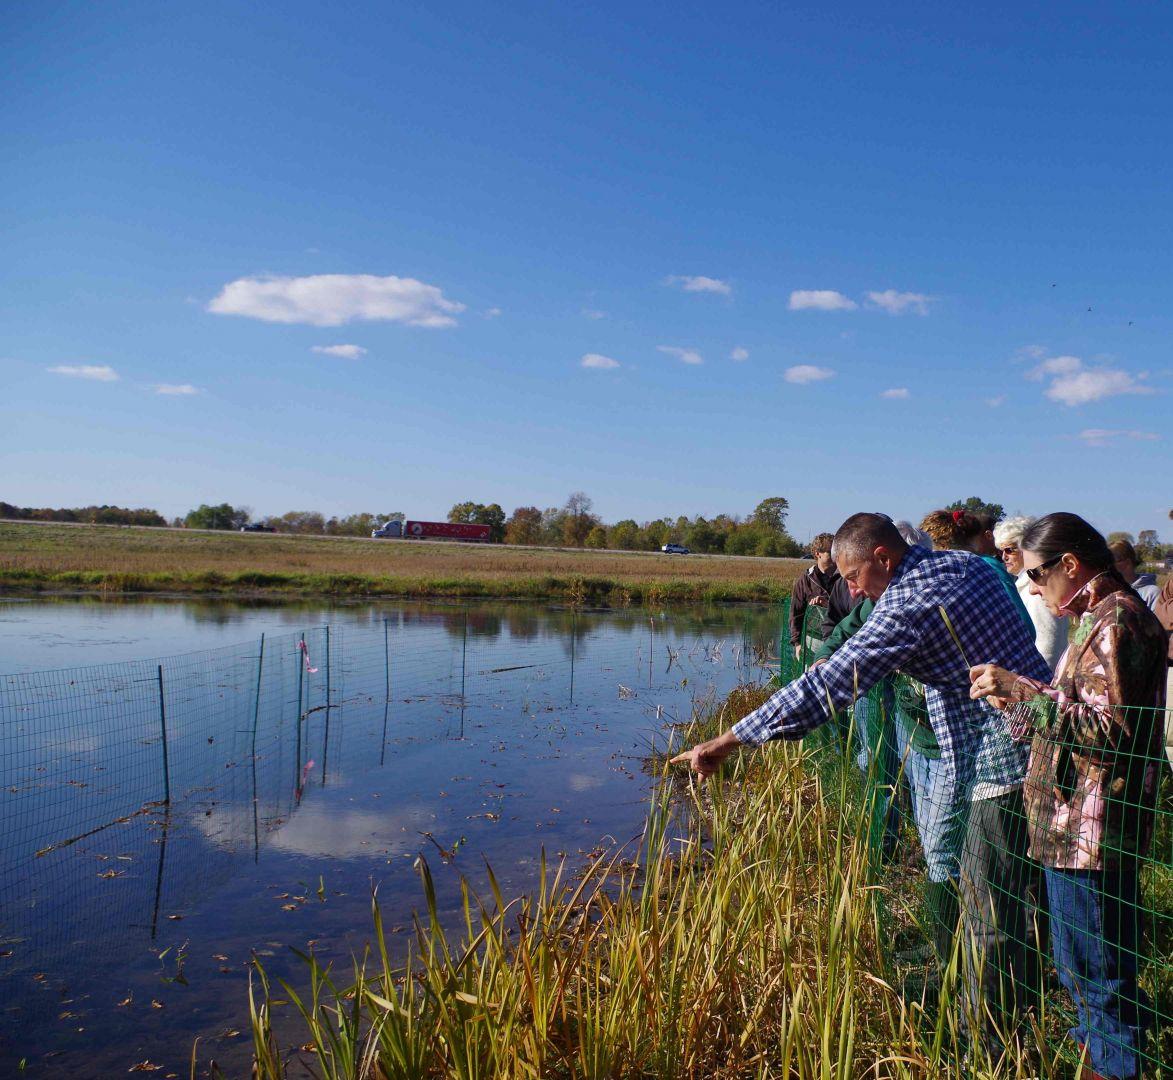 Group looking at water during wetland workshop